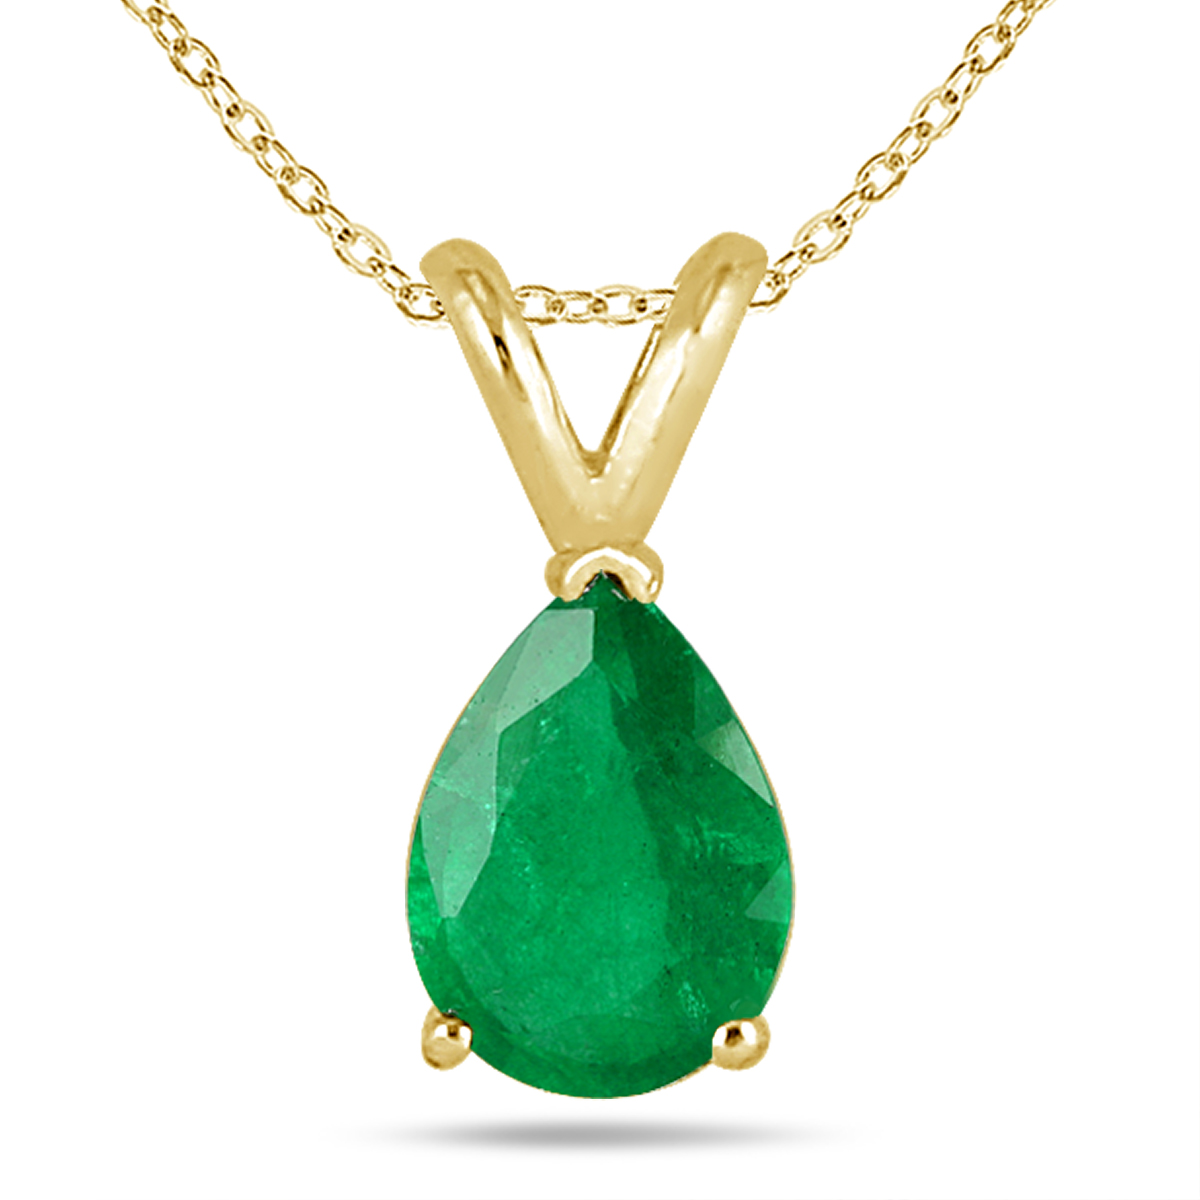 7x5mm Pear Shape Emerald...